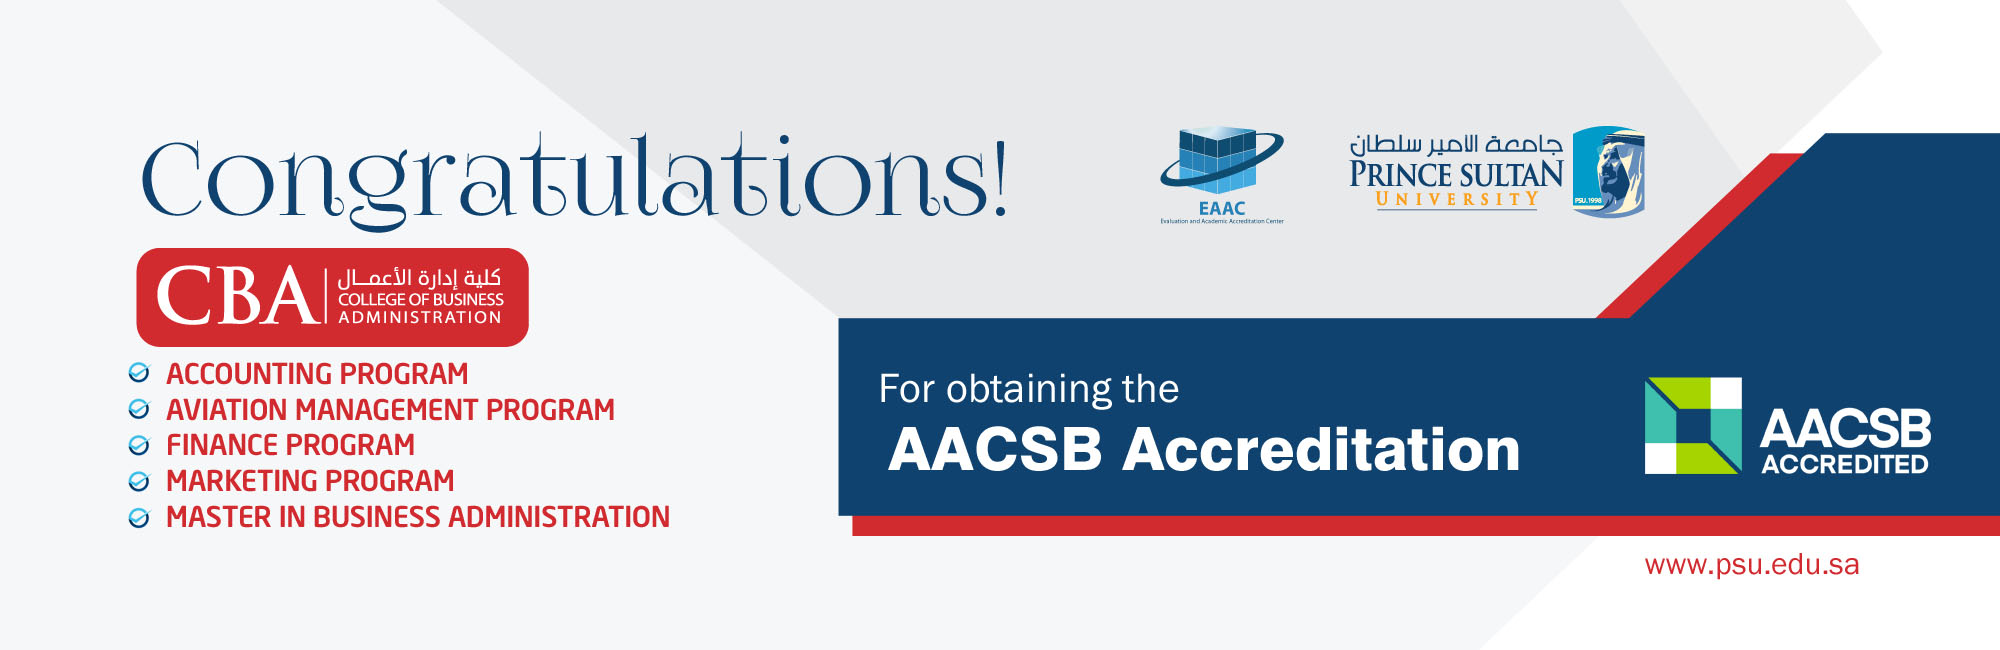 Congratulations Accreditation AACSB CBA